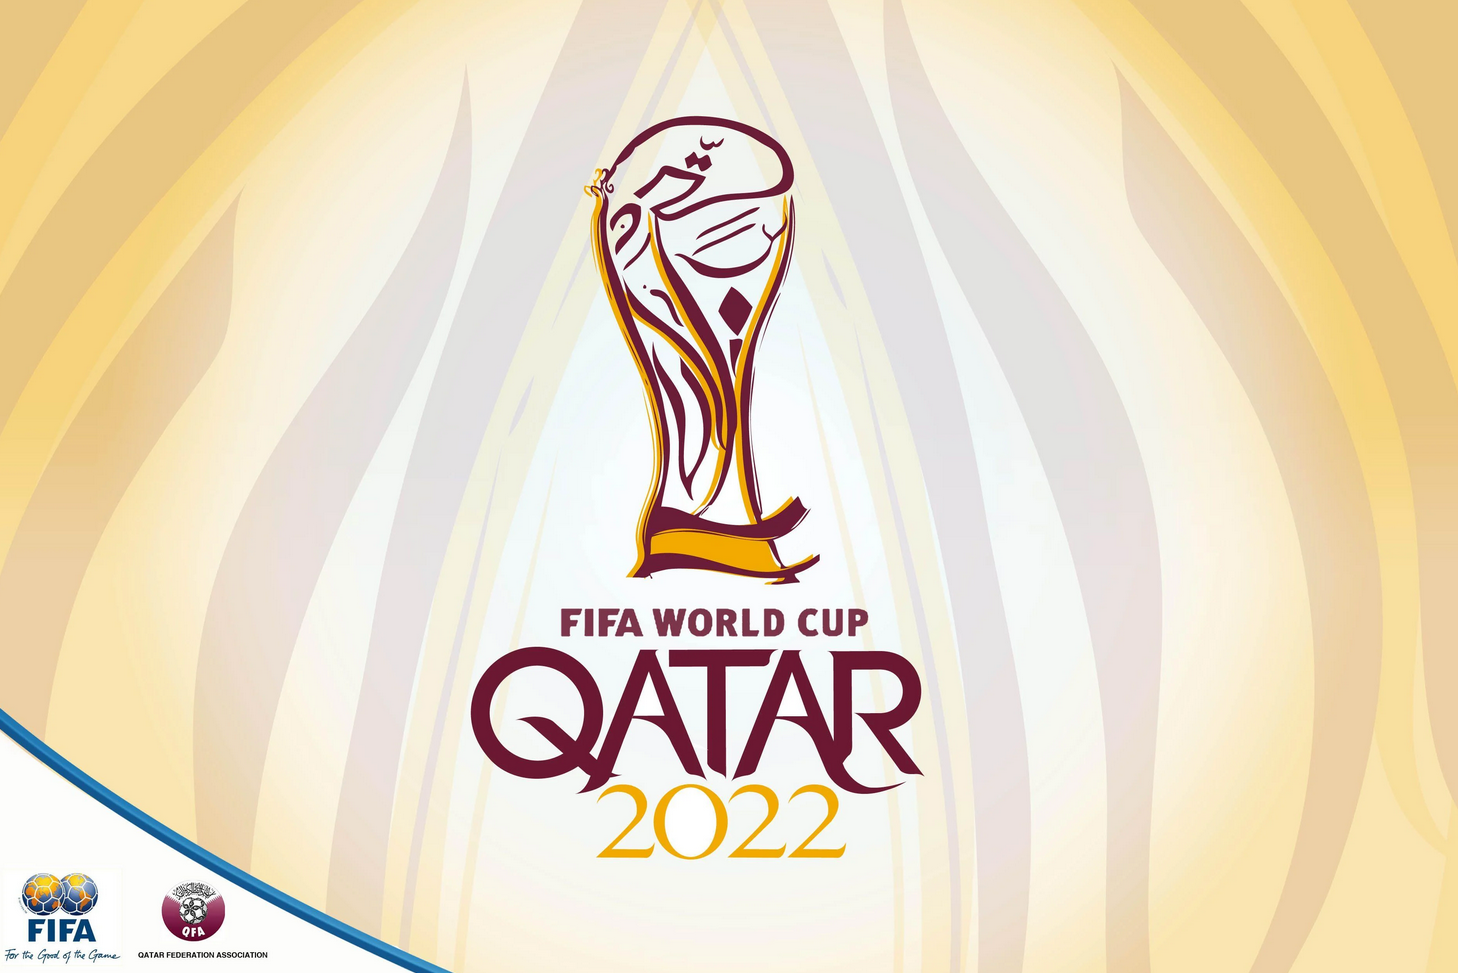 47.-Qatar-Eliminatorias.europeas-wallpaper.png